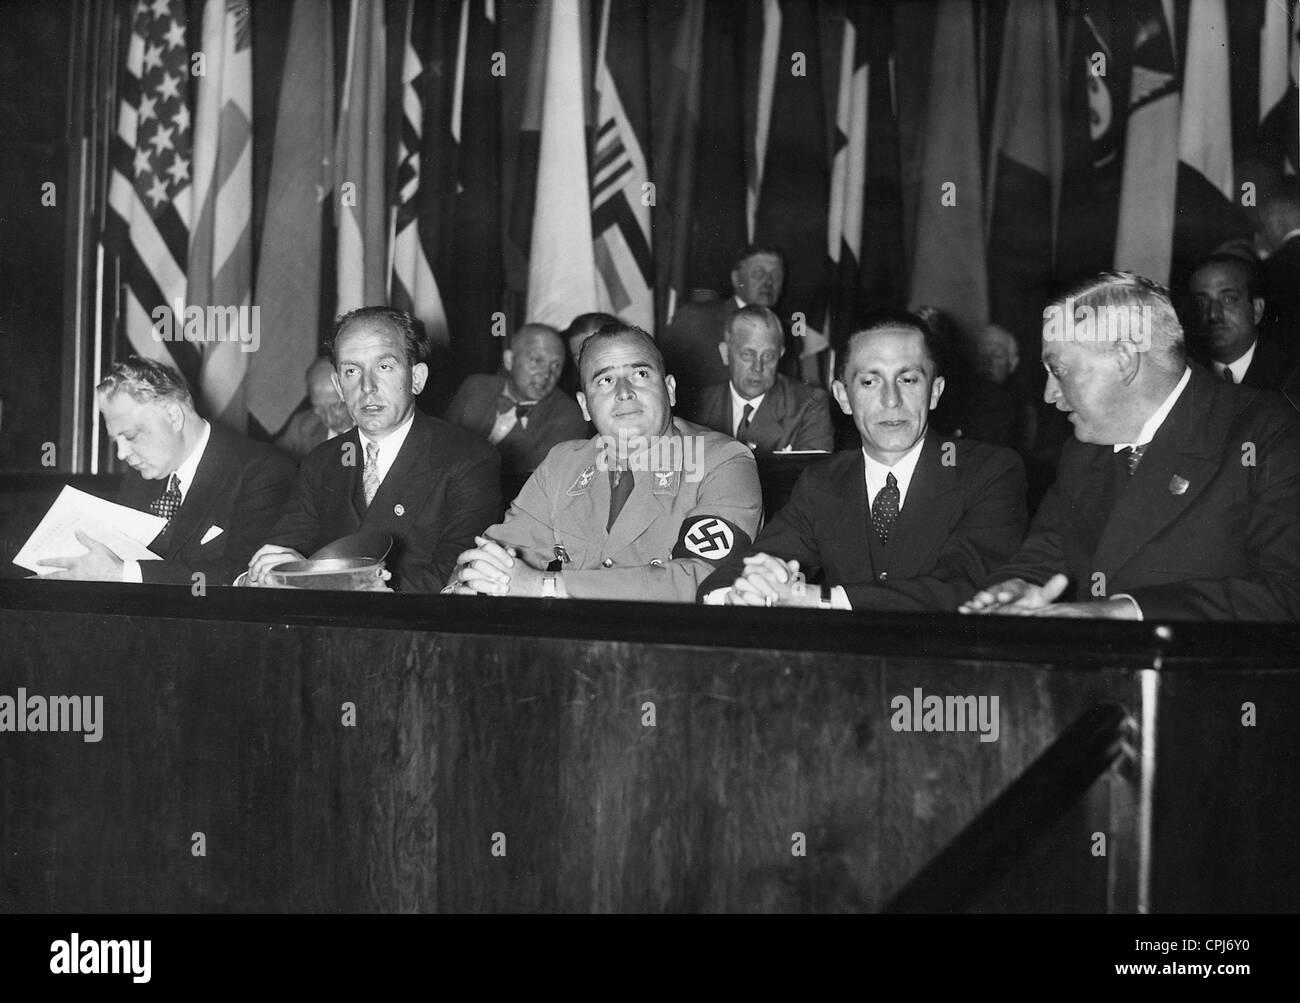 Madrid mueve - Страница 7 Roland-freisler-hans-frank-joseph-goebbels-and-franz-guertner-1935-CPJ6Y0